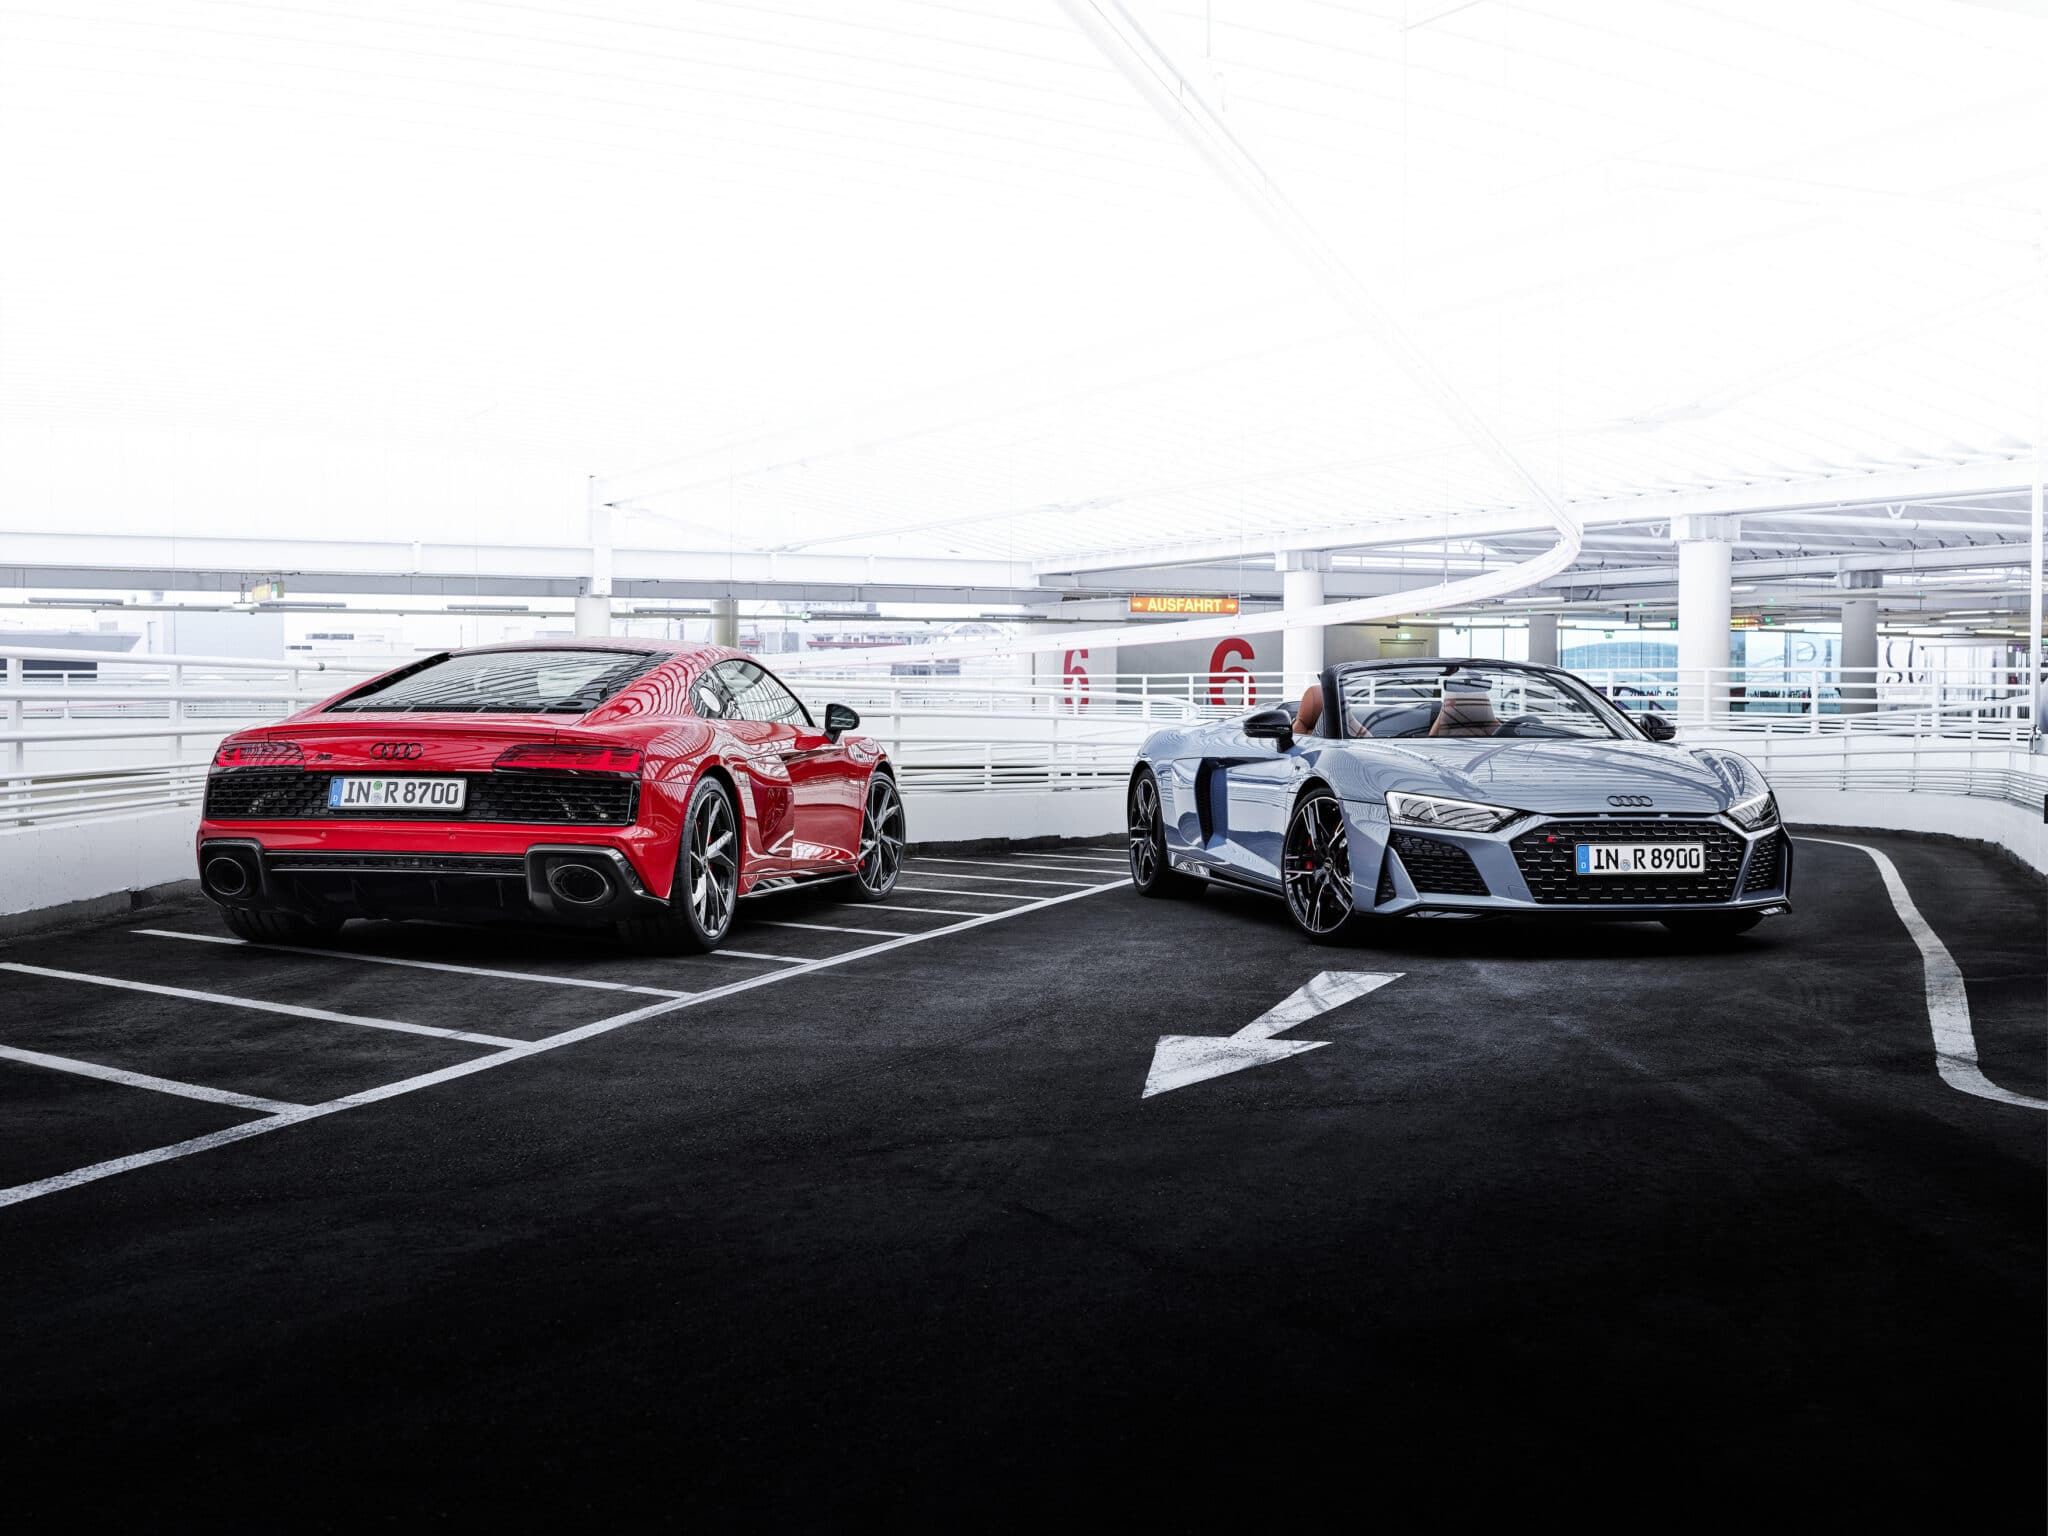 Audi R8 V10 Coupé e Spyder - Copyright foto: ufficio stampa Audi